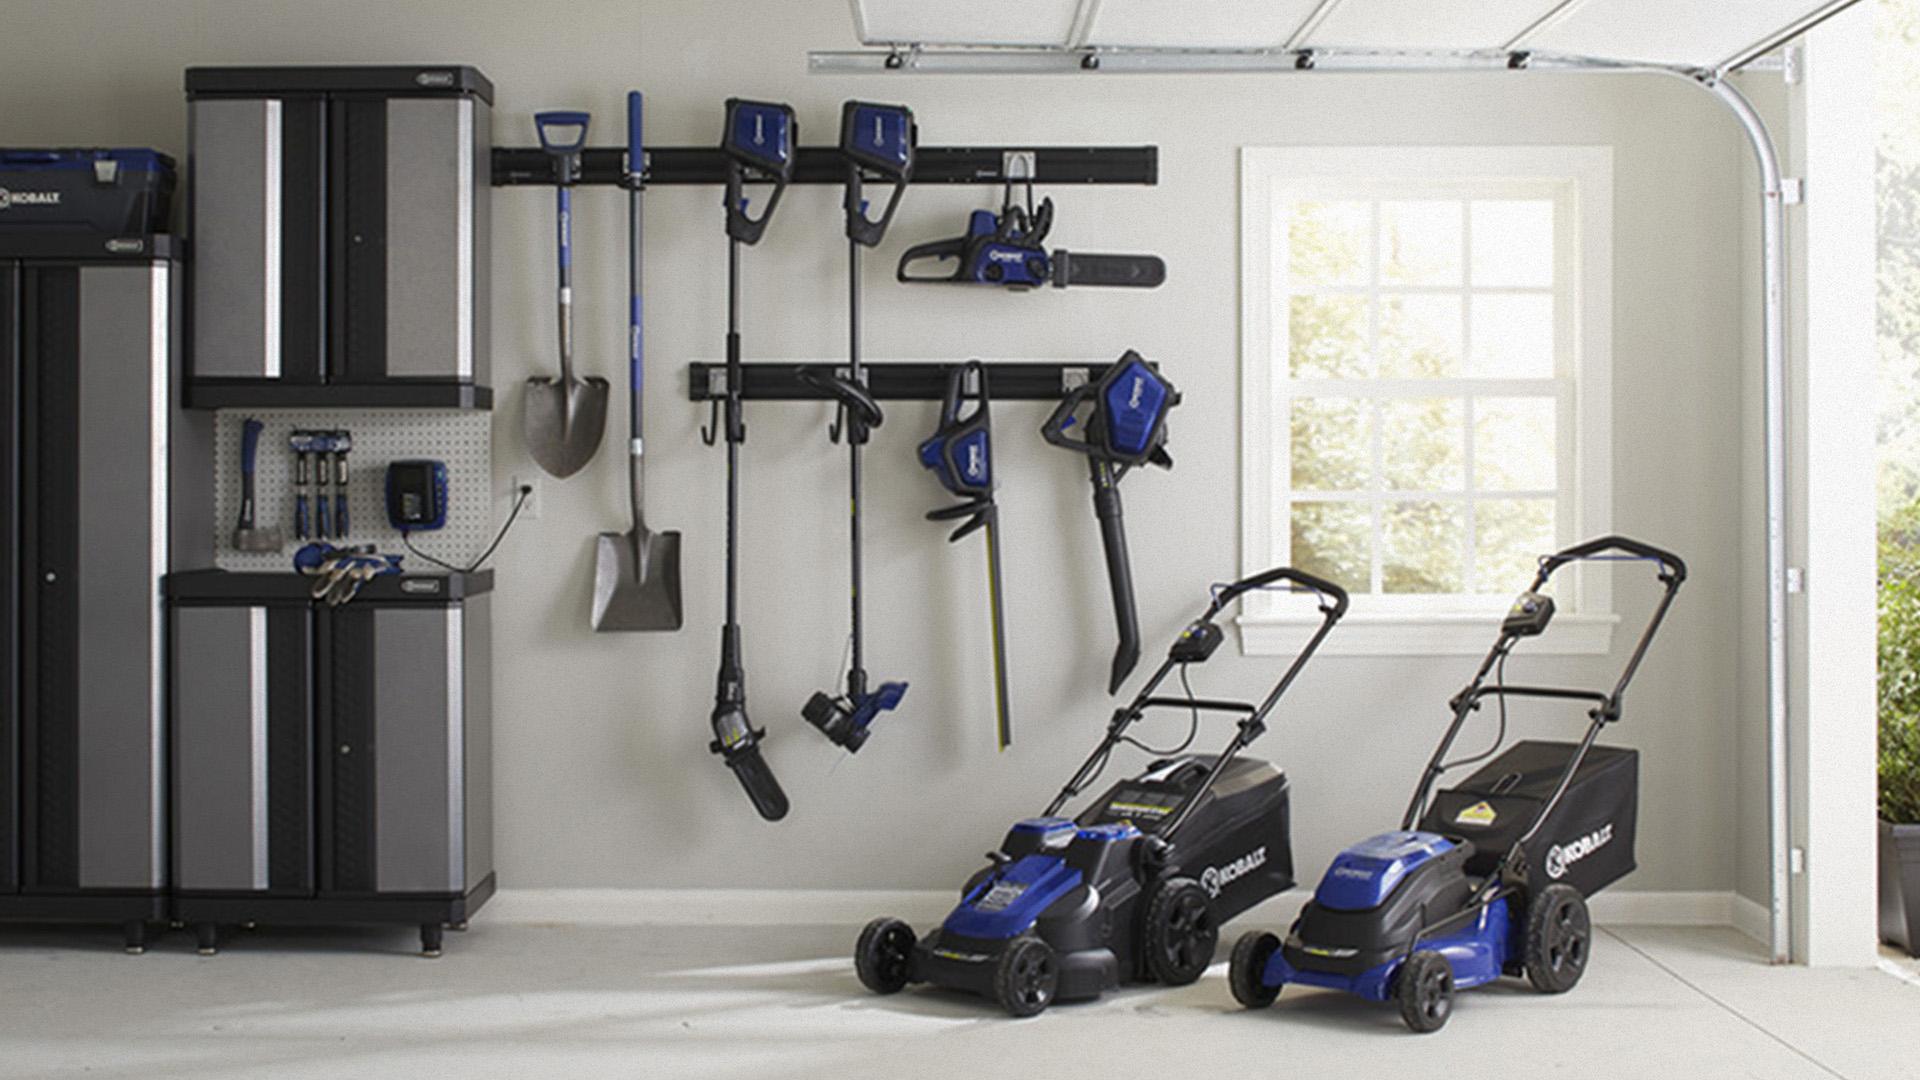 priority_designs_lowes_kobalt_outdoor_power_equipment_design_004